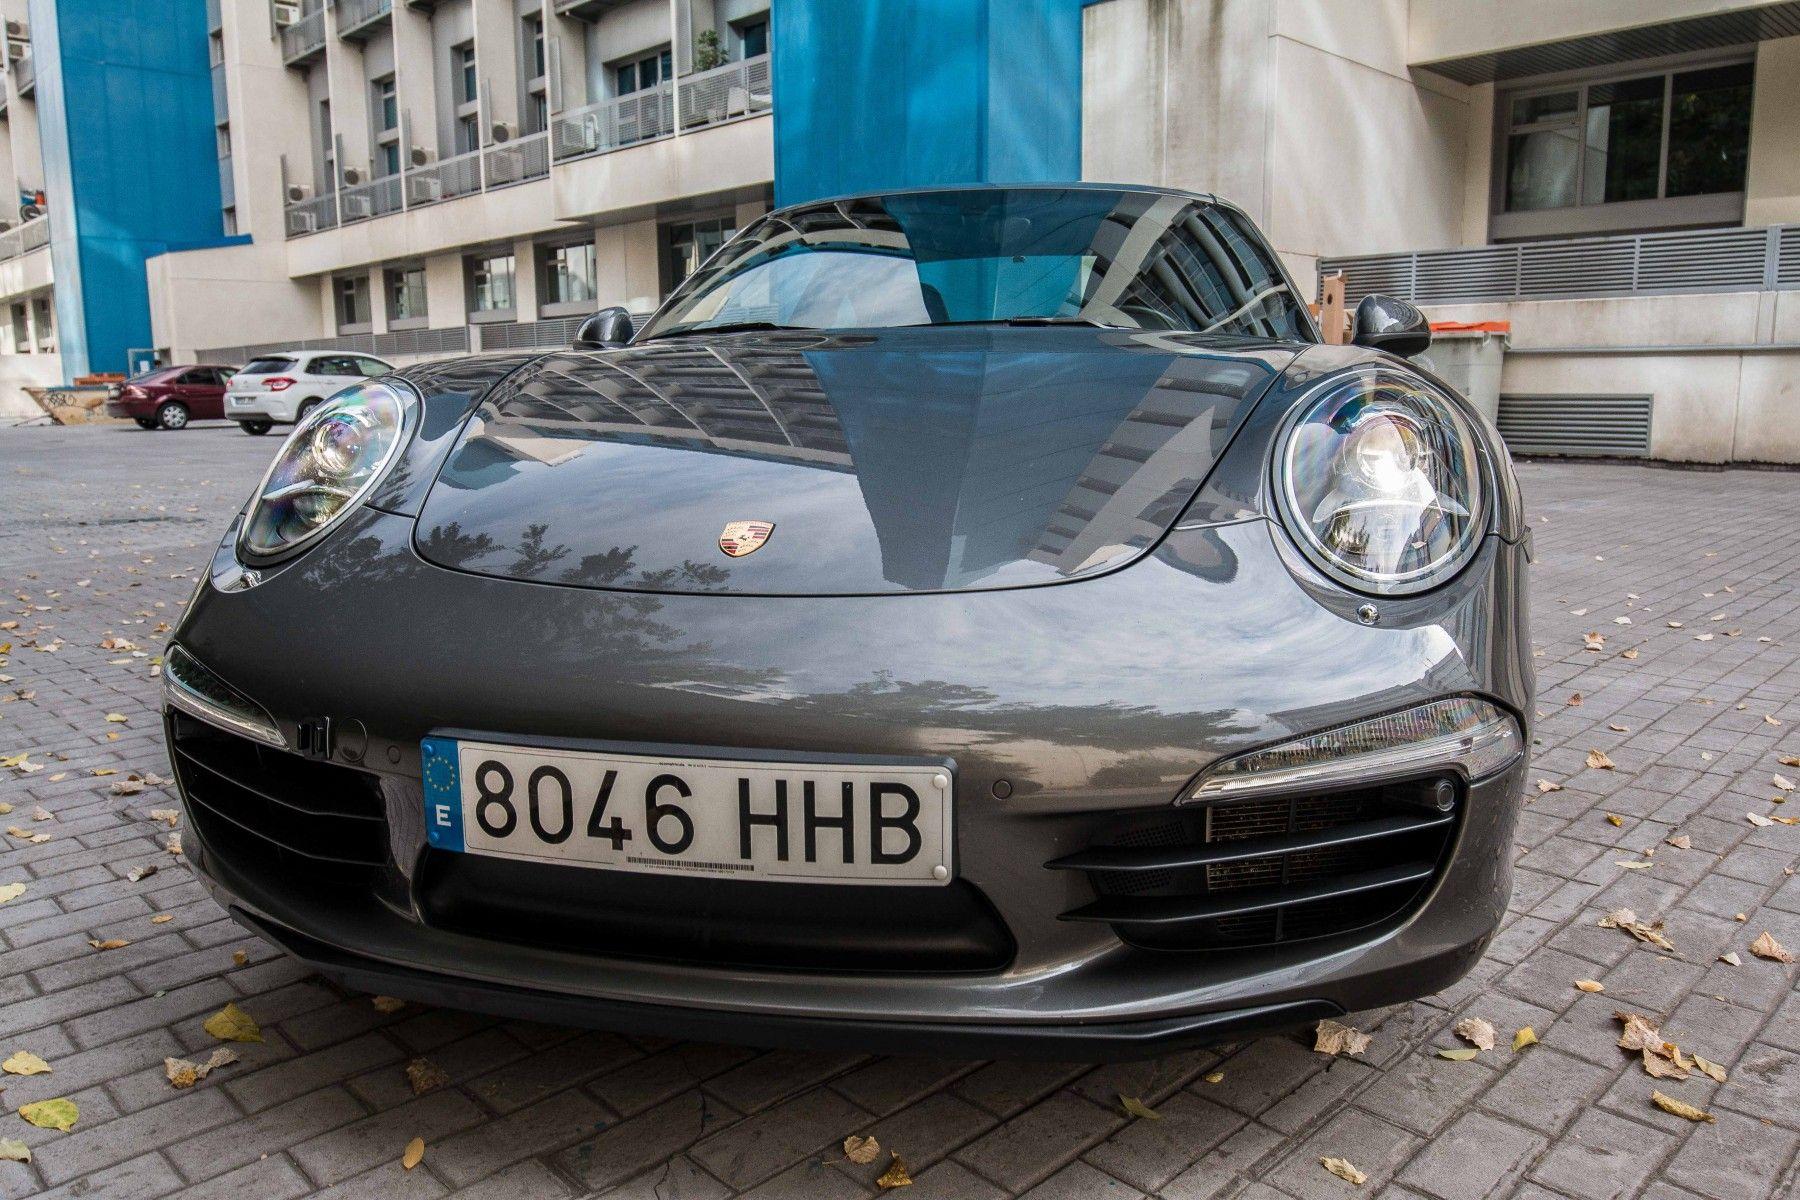 Porsche 911 Carrera 4 S Coupé PDK (2p) (420cv) 2011 (Gasolina) -  10